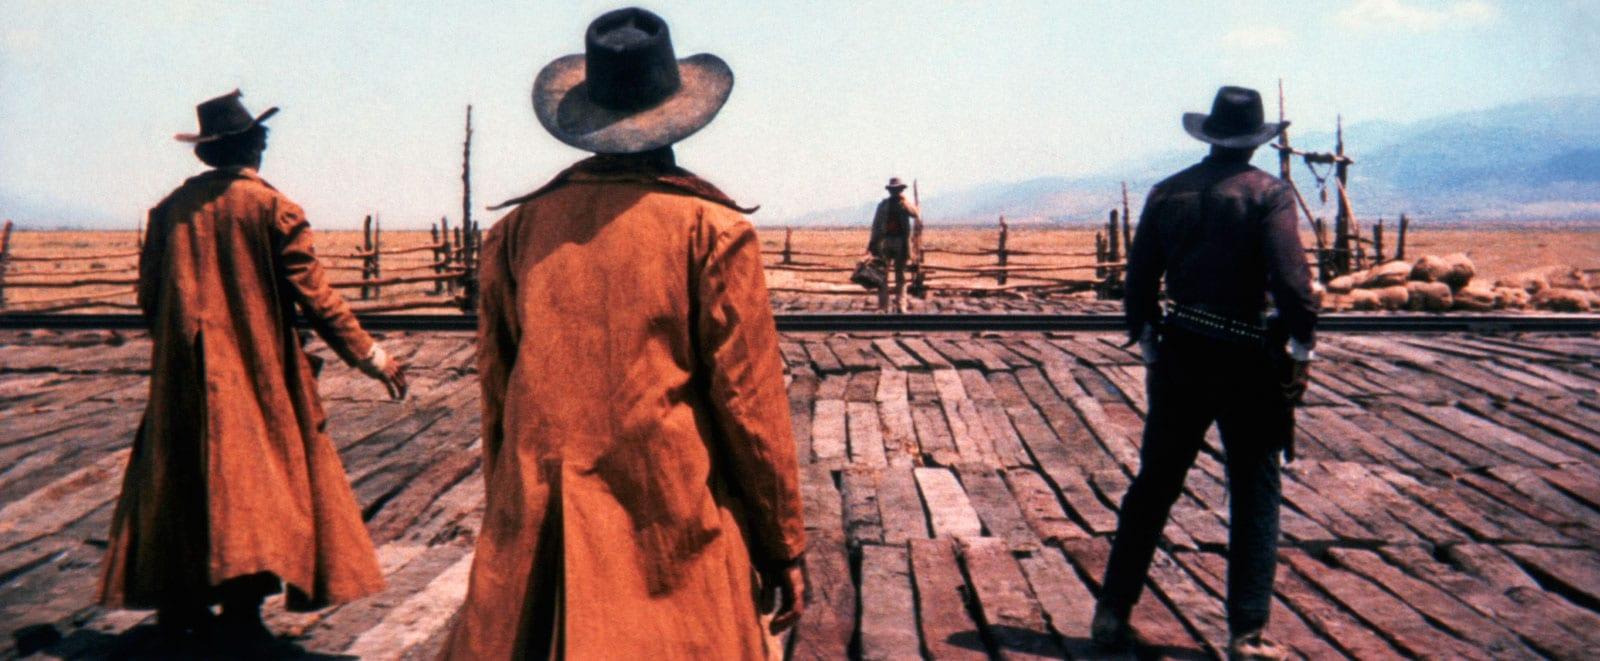 Western Videos